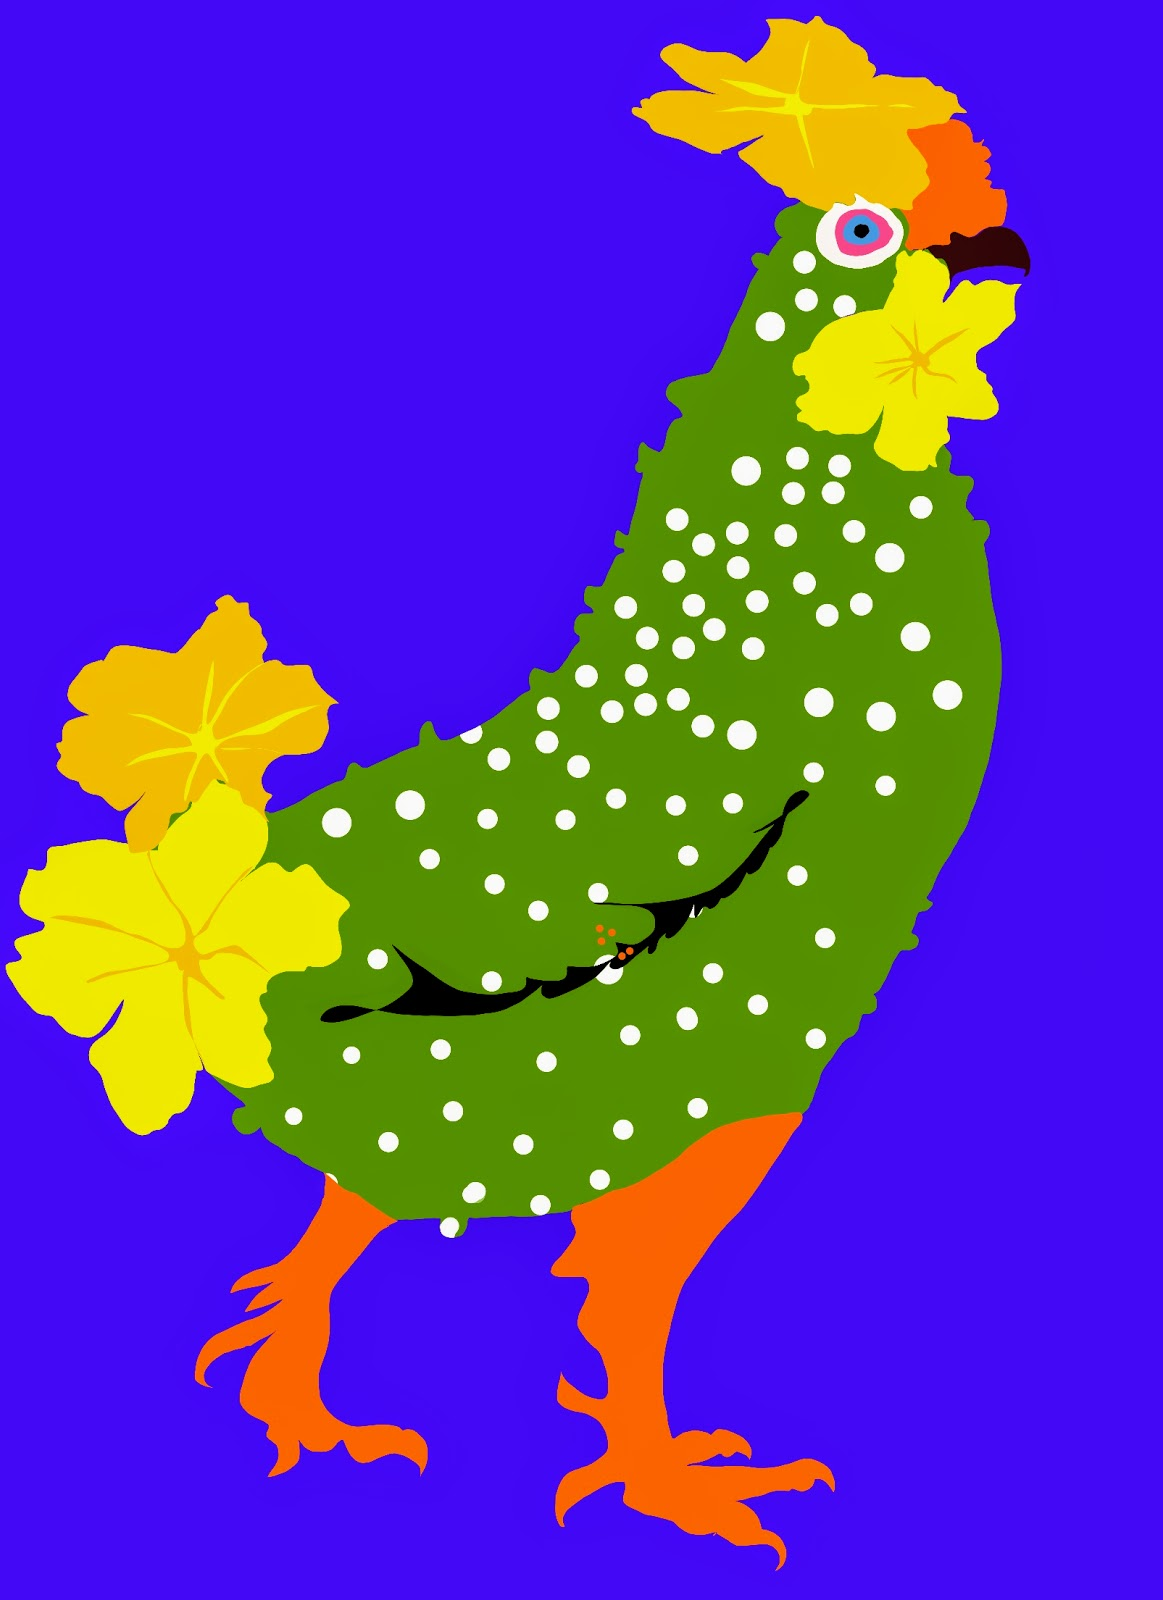 Cucumber and chicken chromosplice illustration.